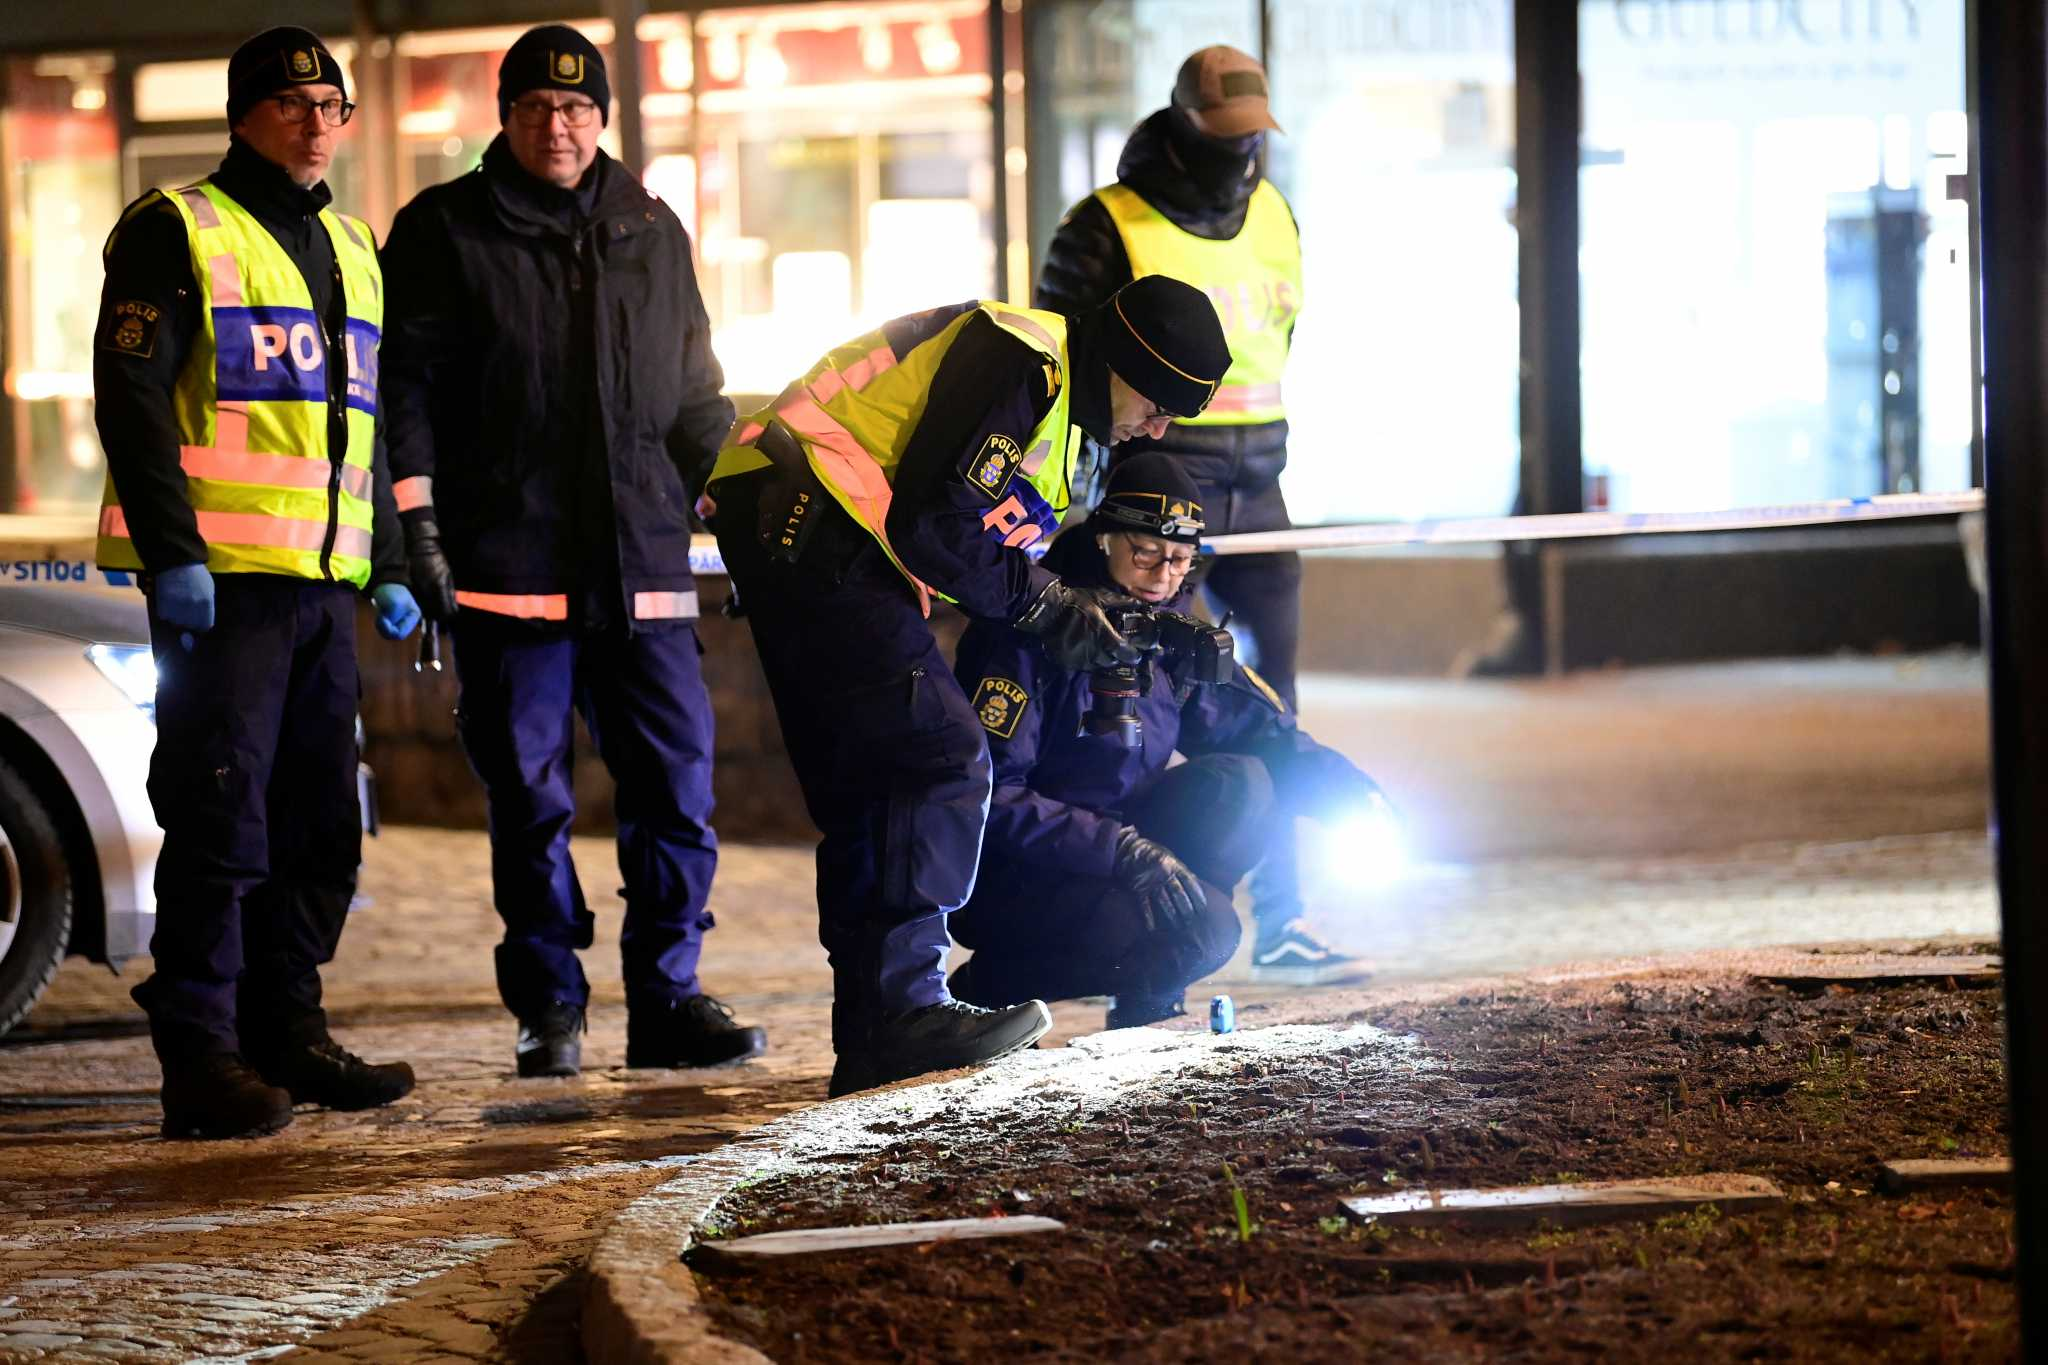 sweden_attack_r_0303_1-1-2048x1365